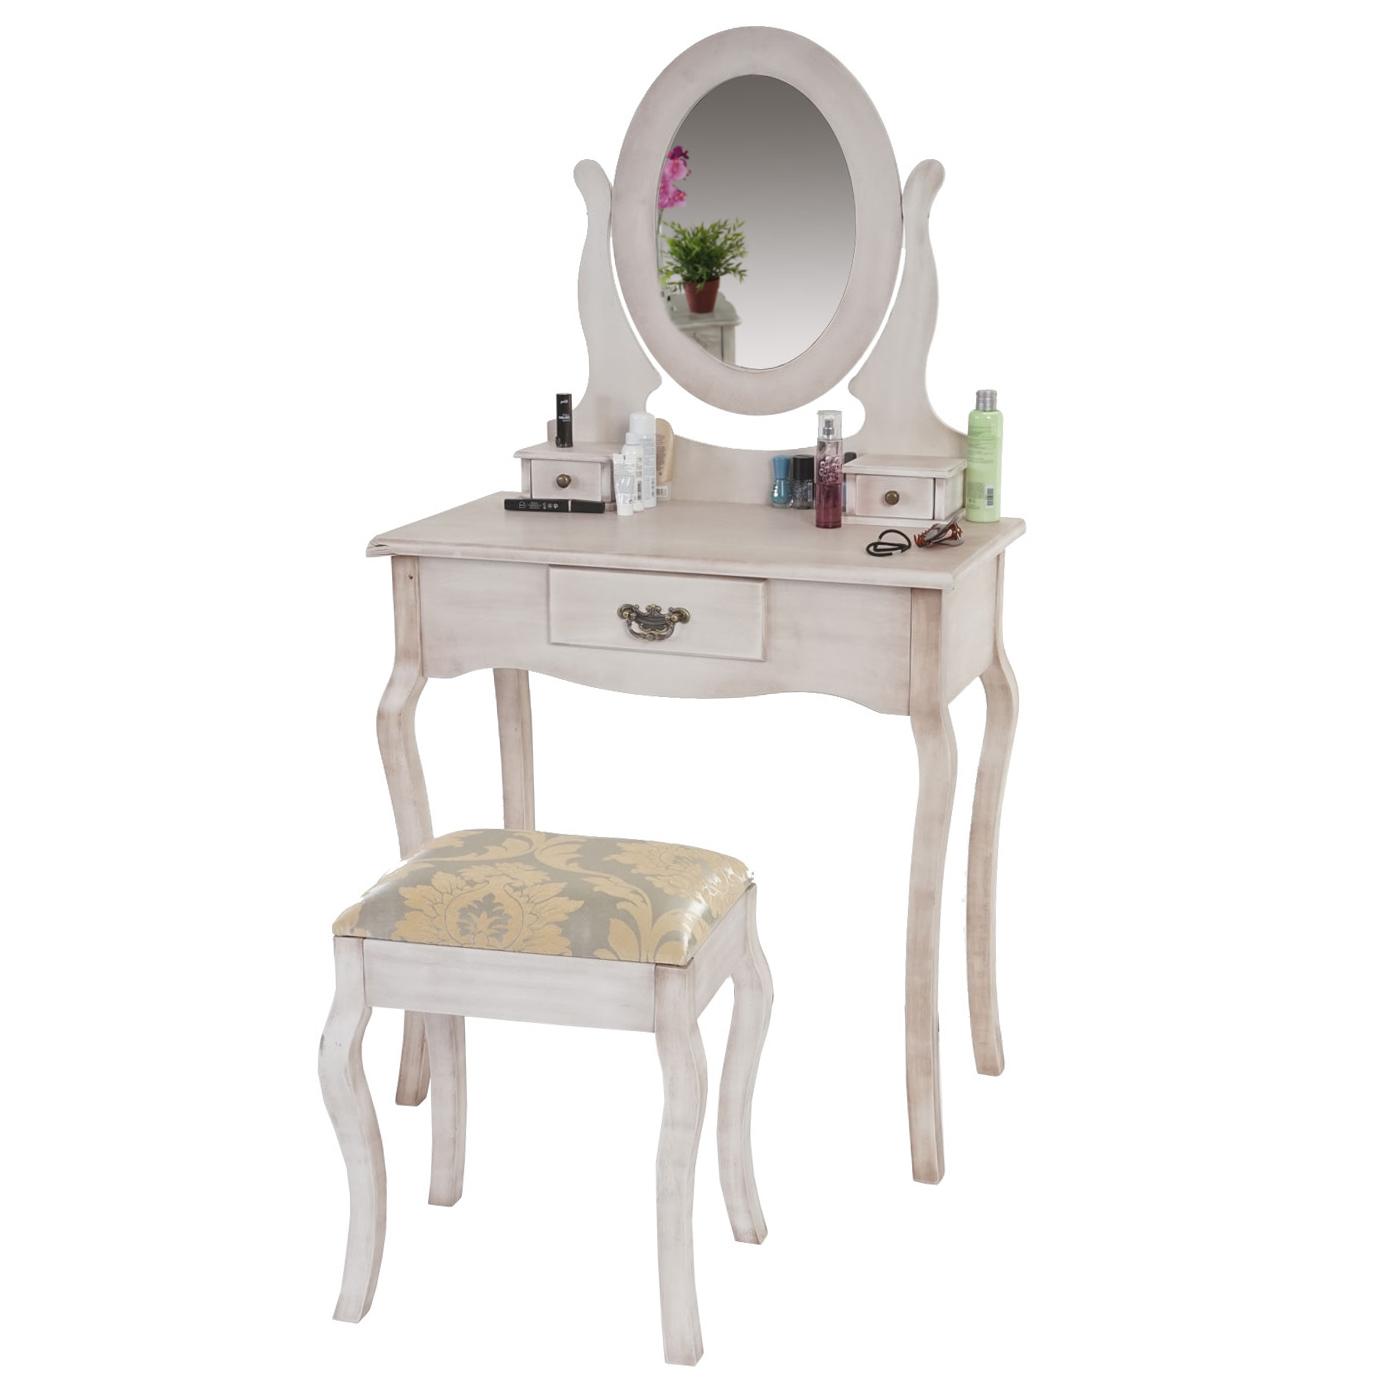 m bel wohnen tische schminktische teuer hat hier. Black Bedroom Furniture Sets. Home Design Ideas